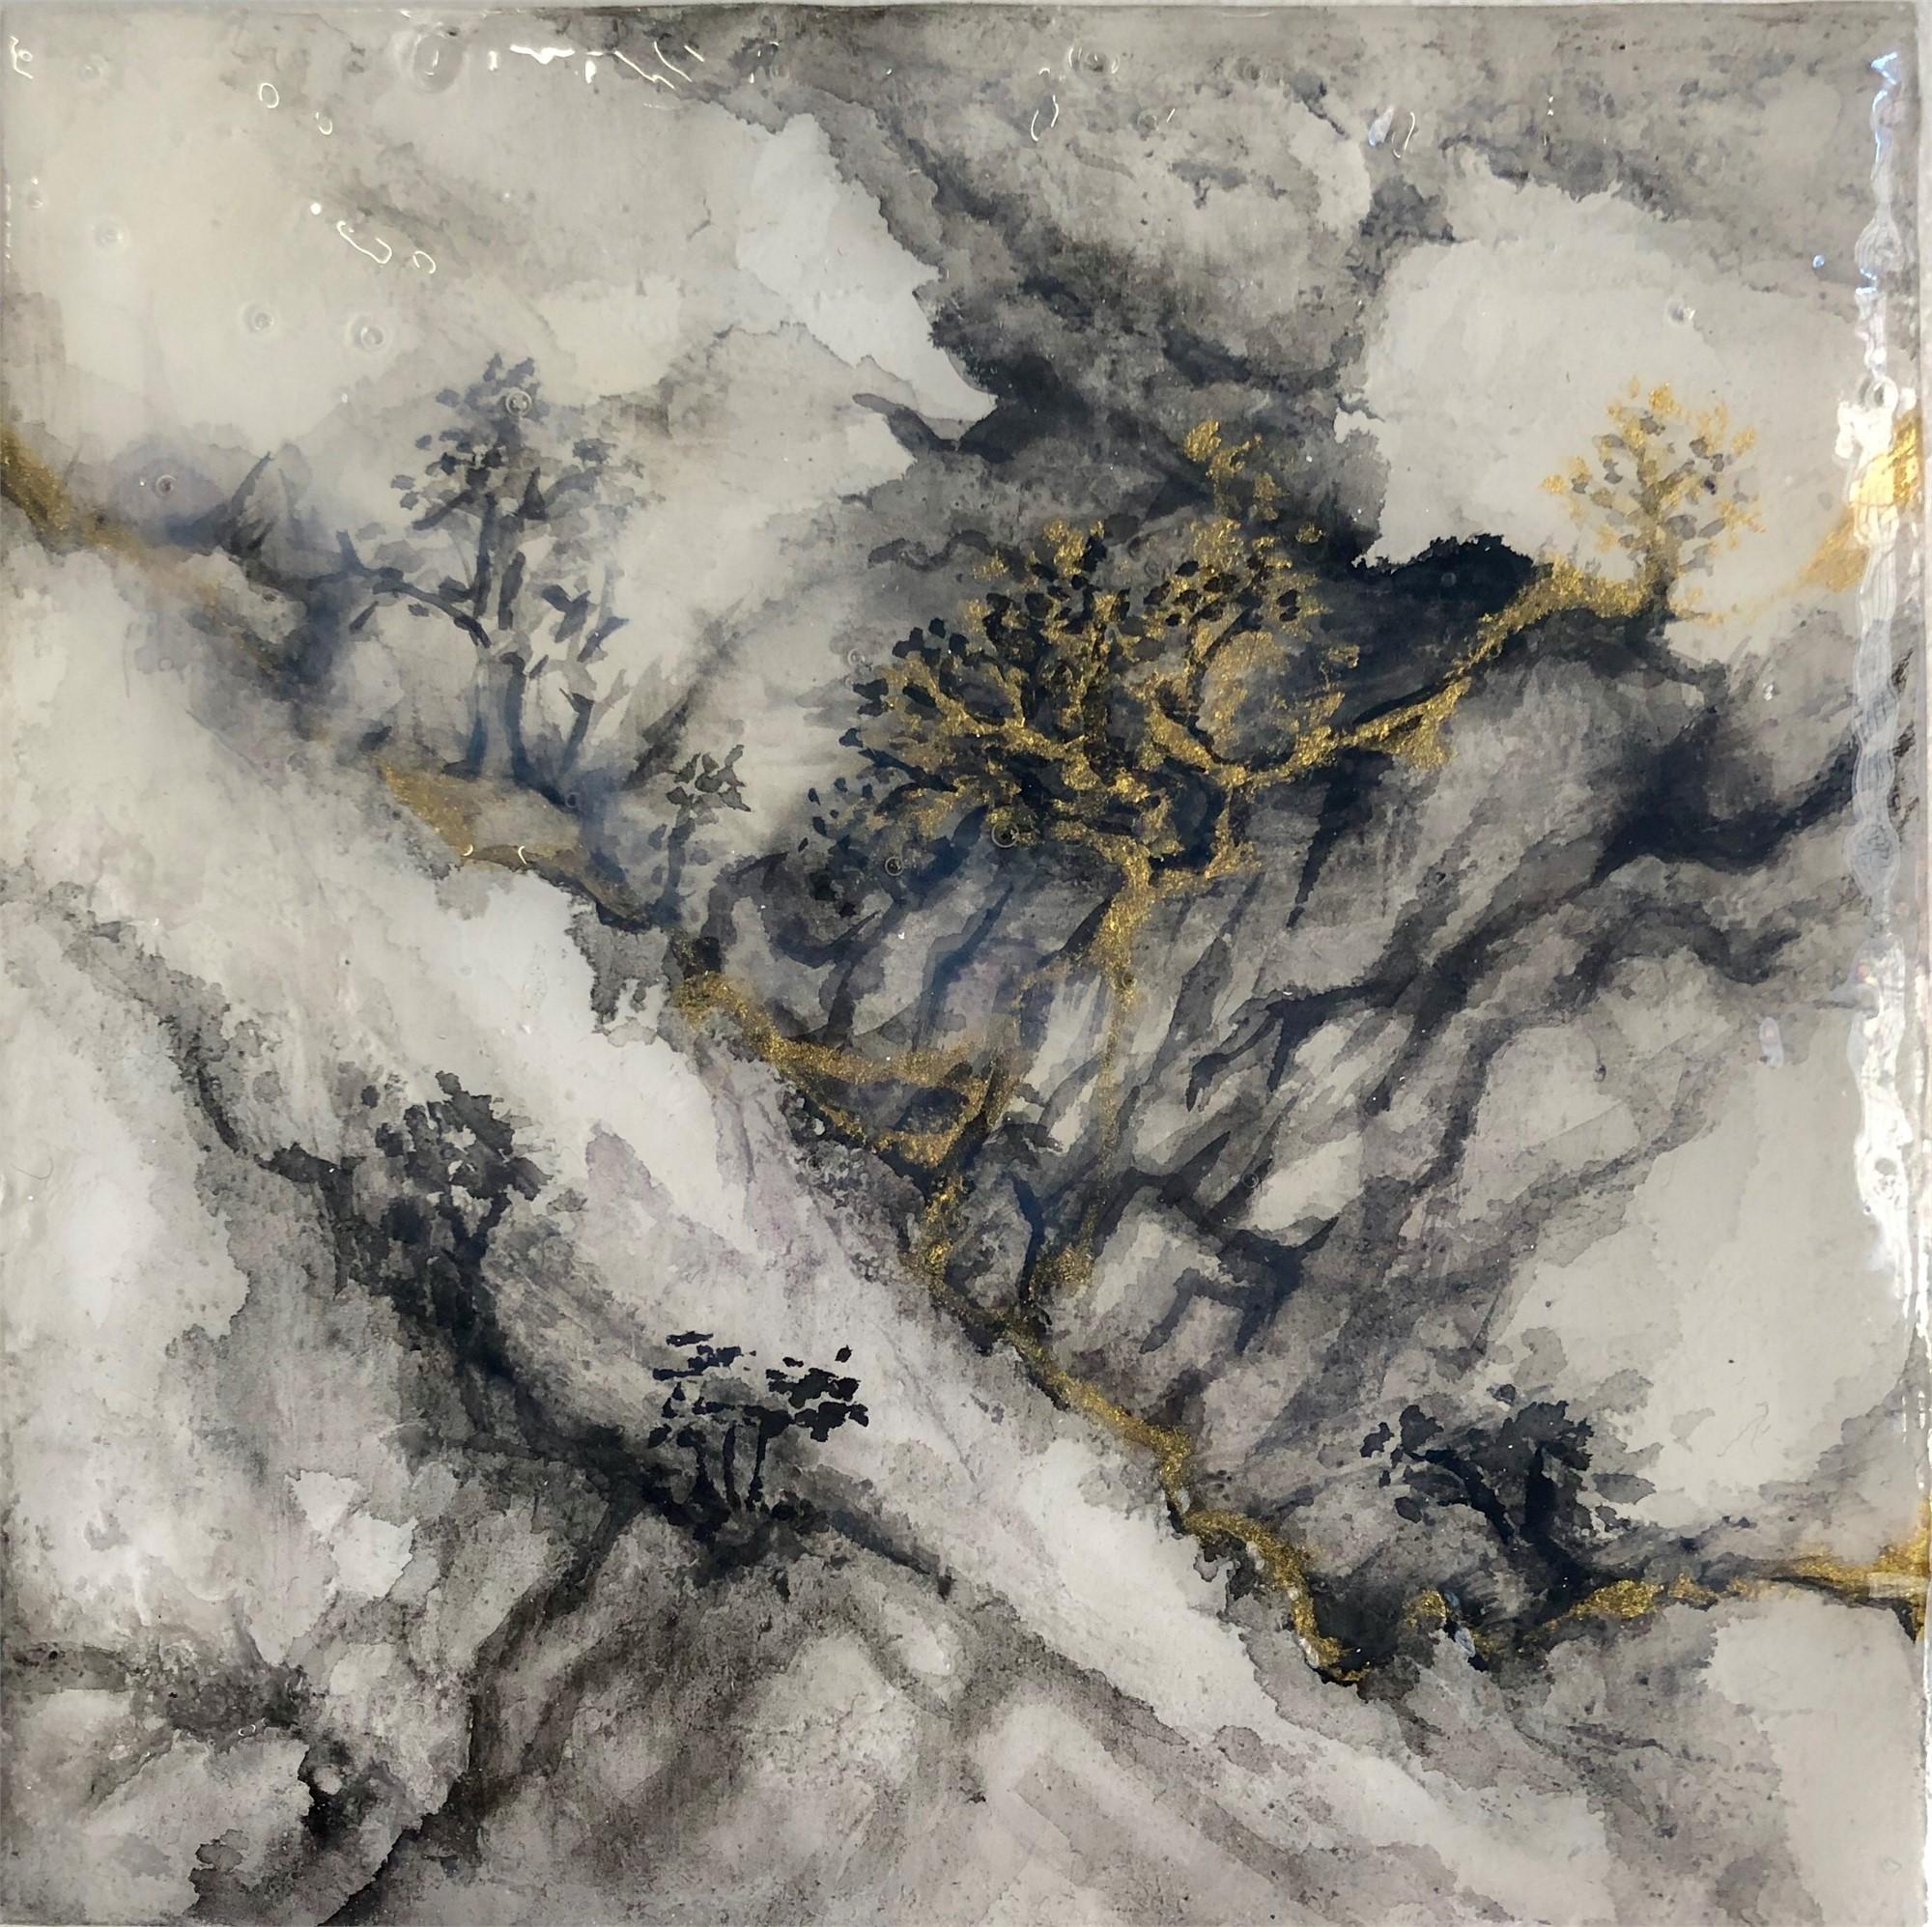 Alchemy by Cindy Shih